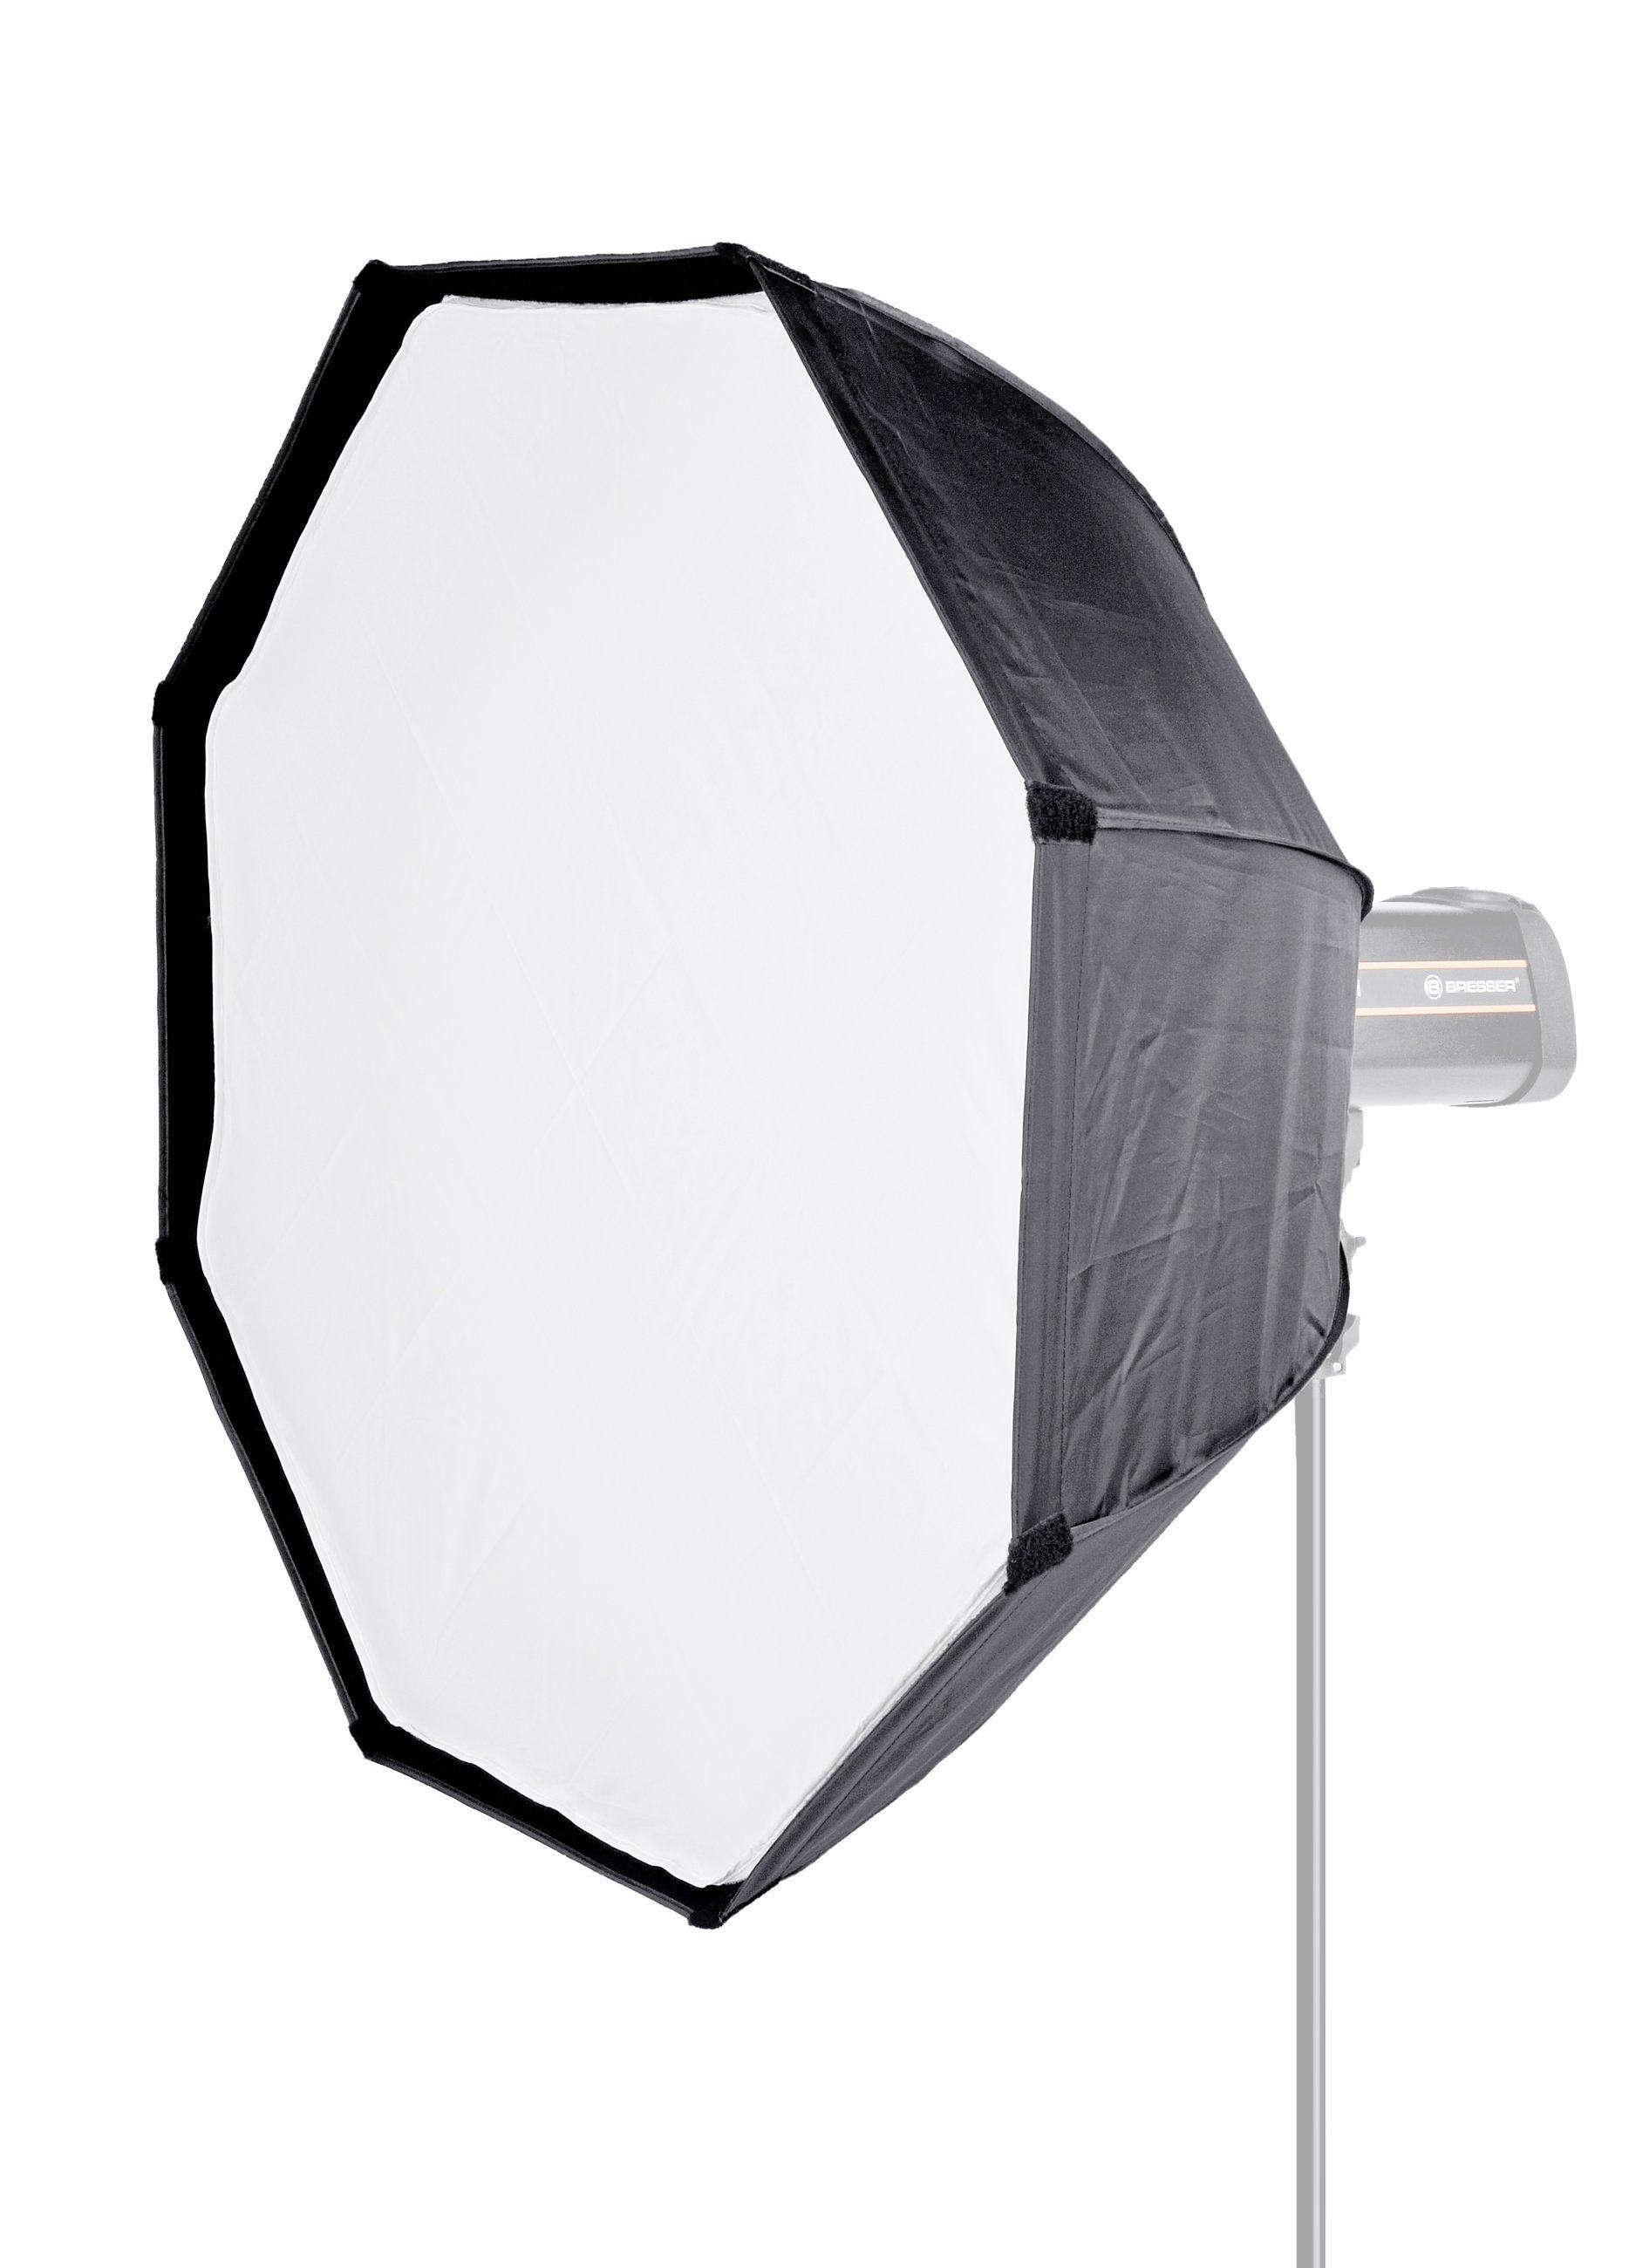 BRESSER Fotostudio »BRESSER SS-7 Octabox High Grade 150cm mit Wabengit«